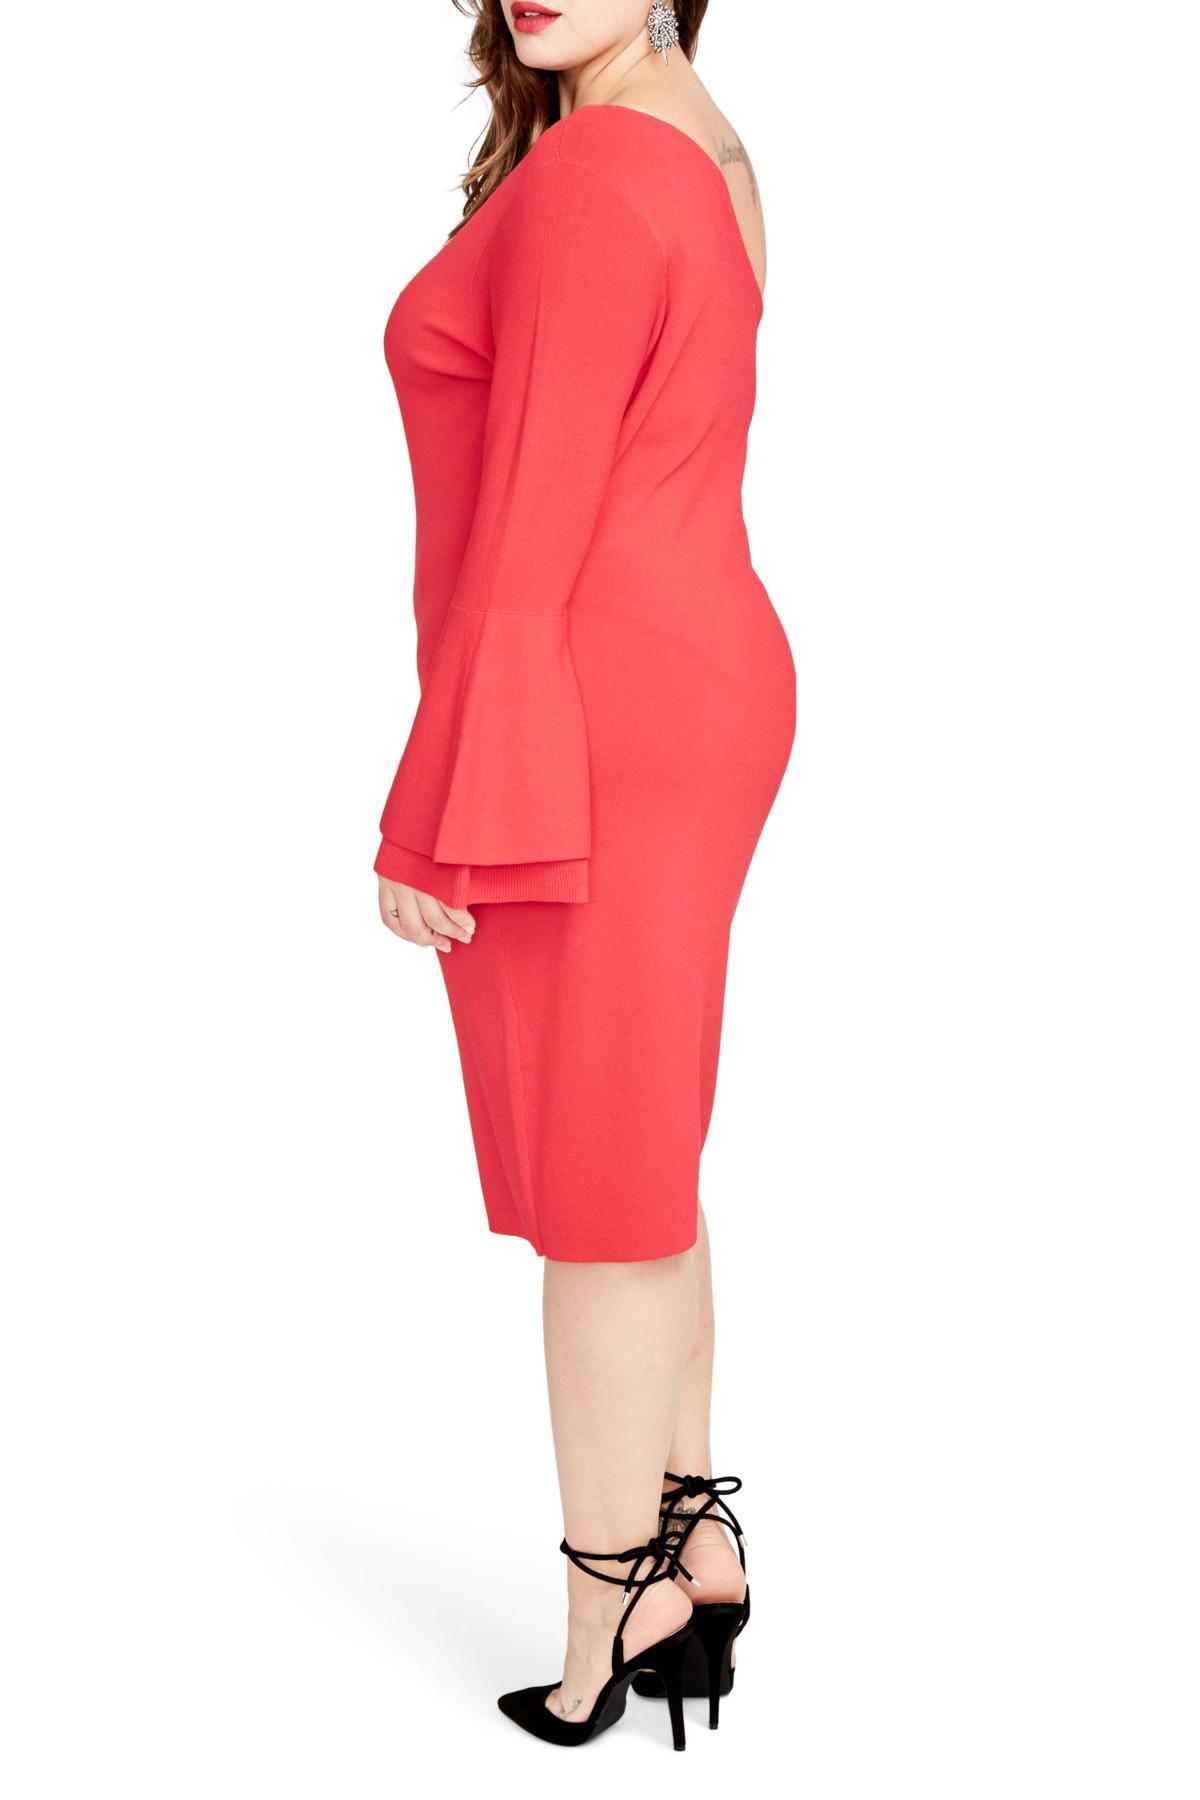 bb29b84c44042 RACHEL Rachel Roy - Red One-shoulder Knit Sheath Dress (plus Size) -. View  fullscreen